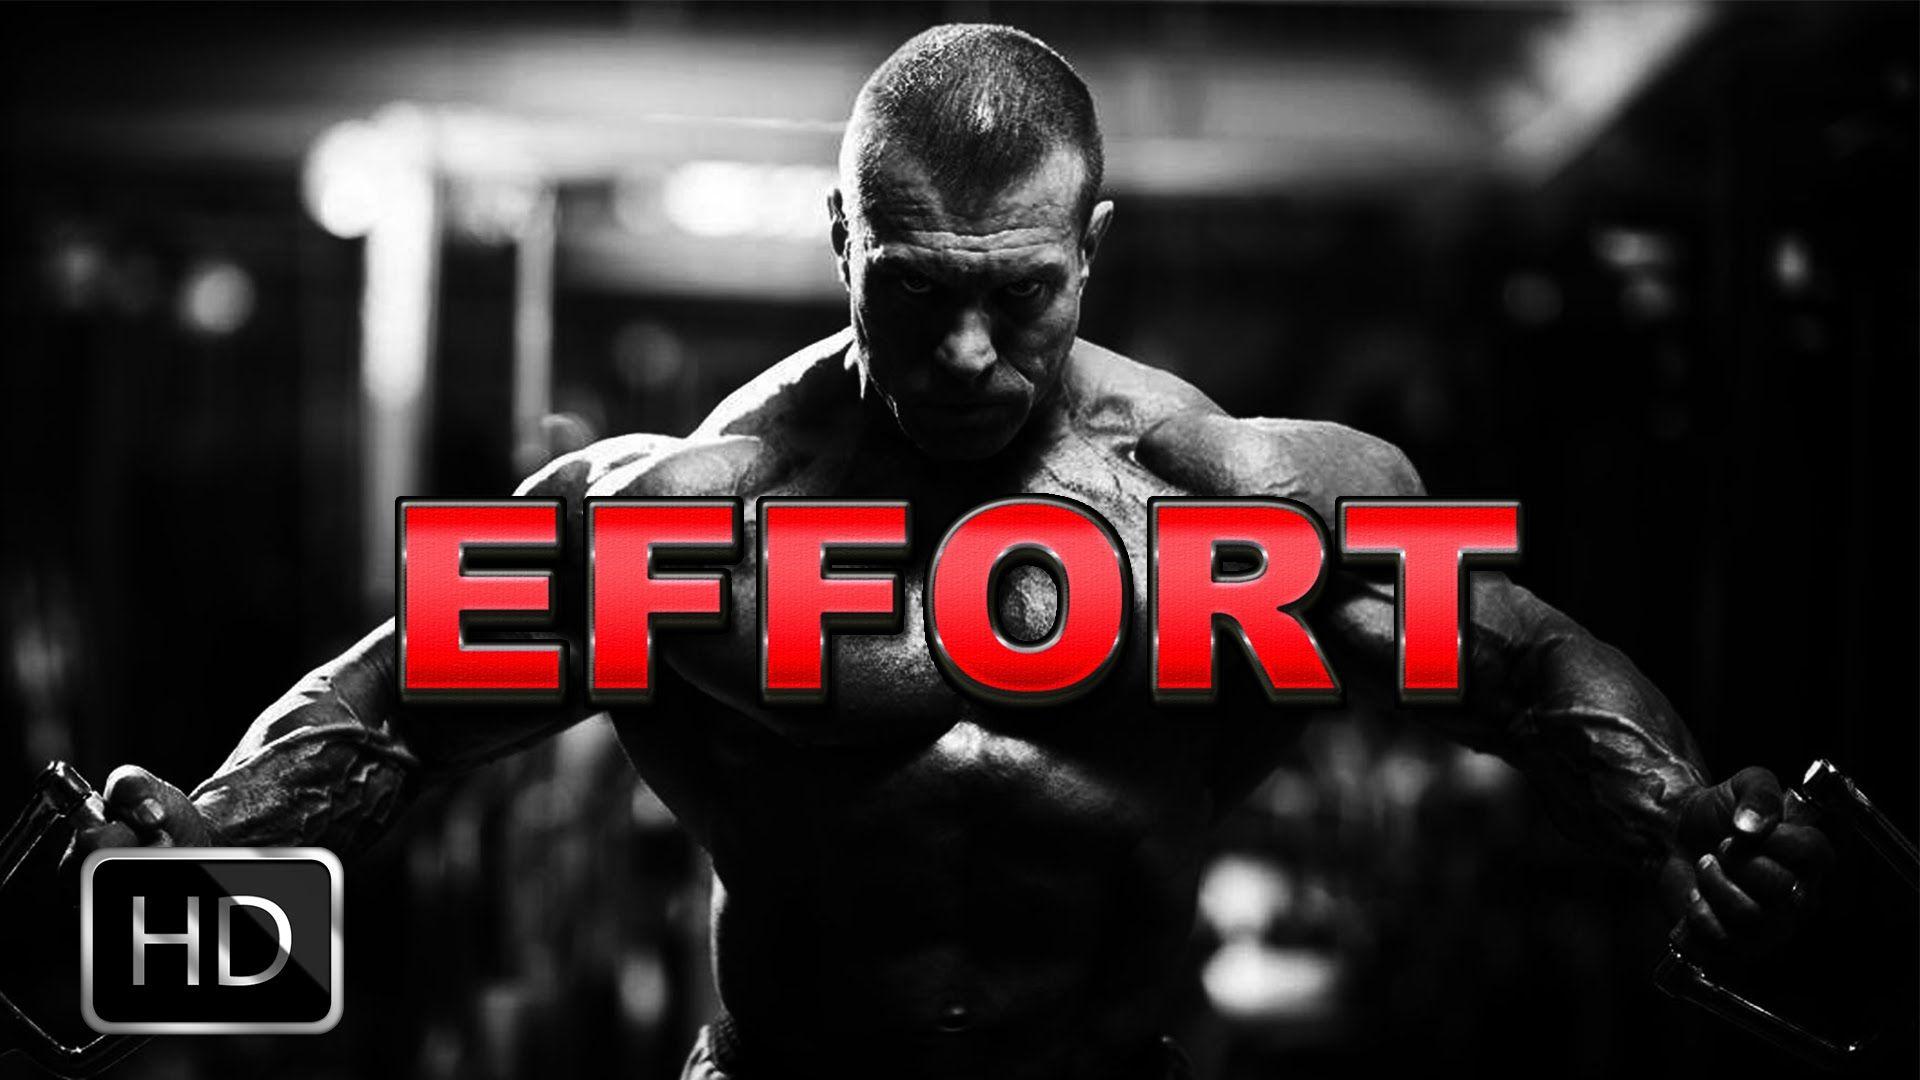 The Best Motivation Video 2015 - EFFORT